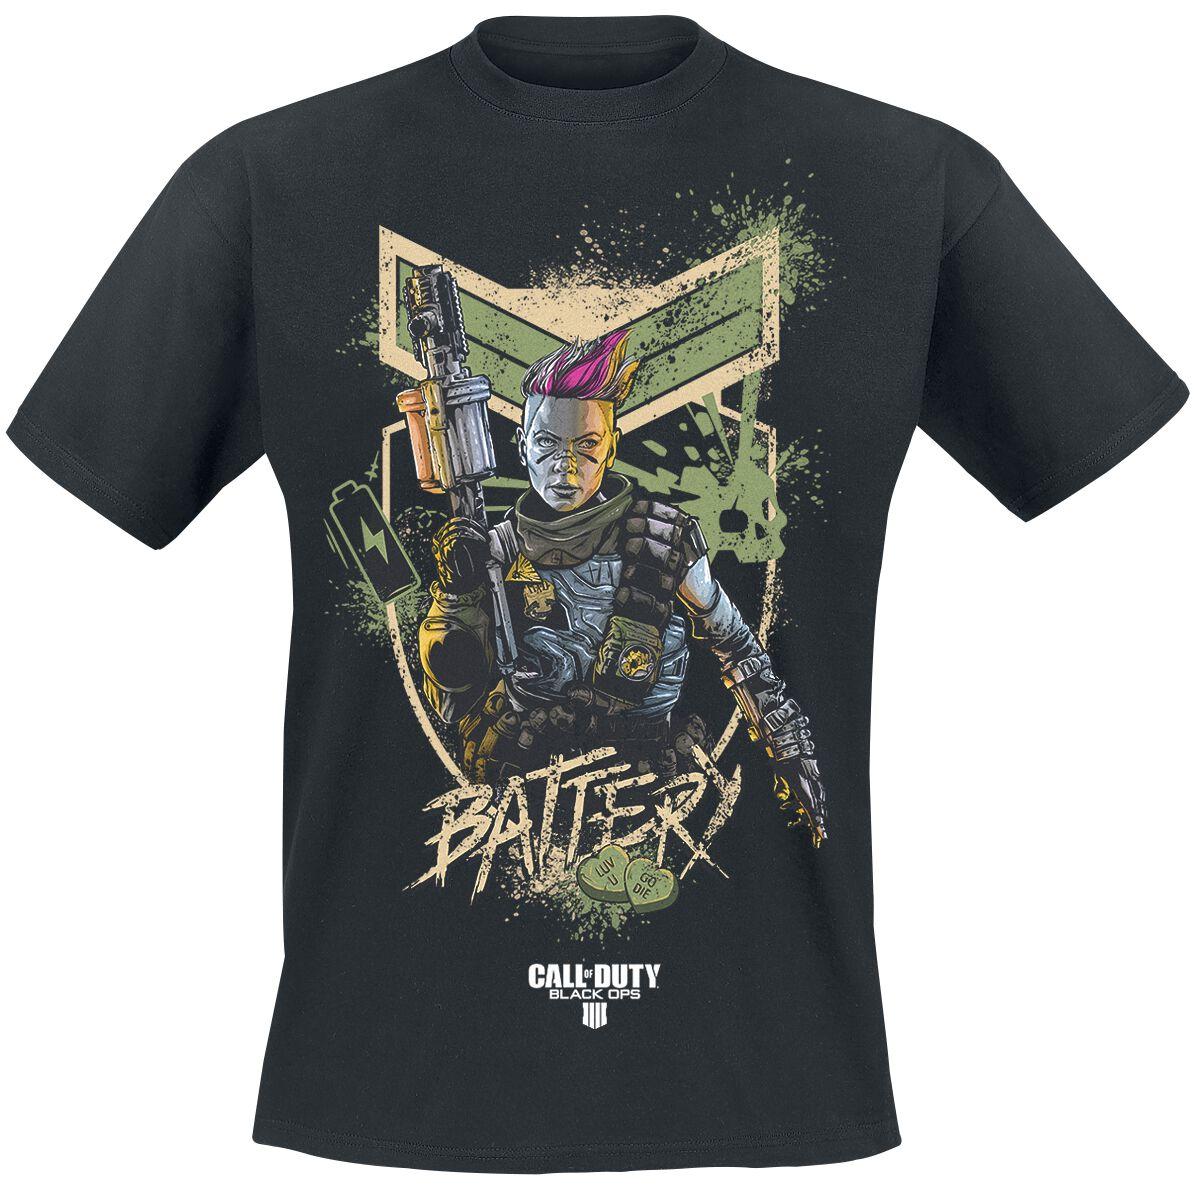 Image of   Call Of Duty Black Ops 4 - Battery Girlie trøje sort